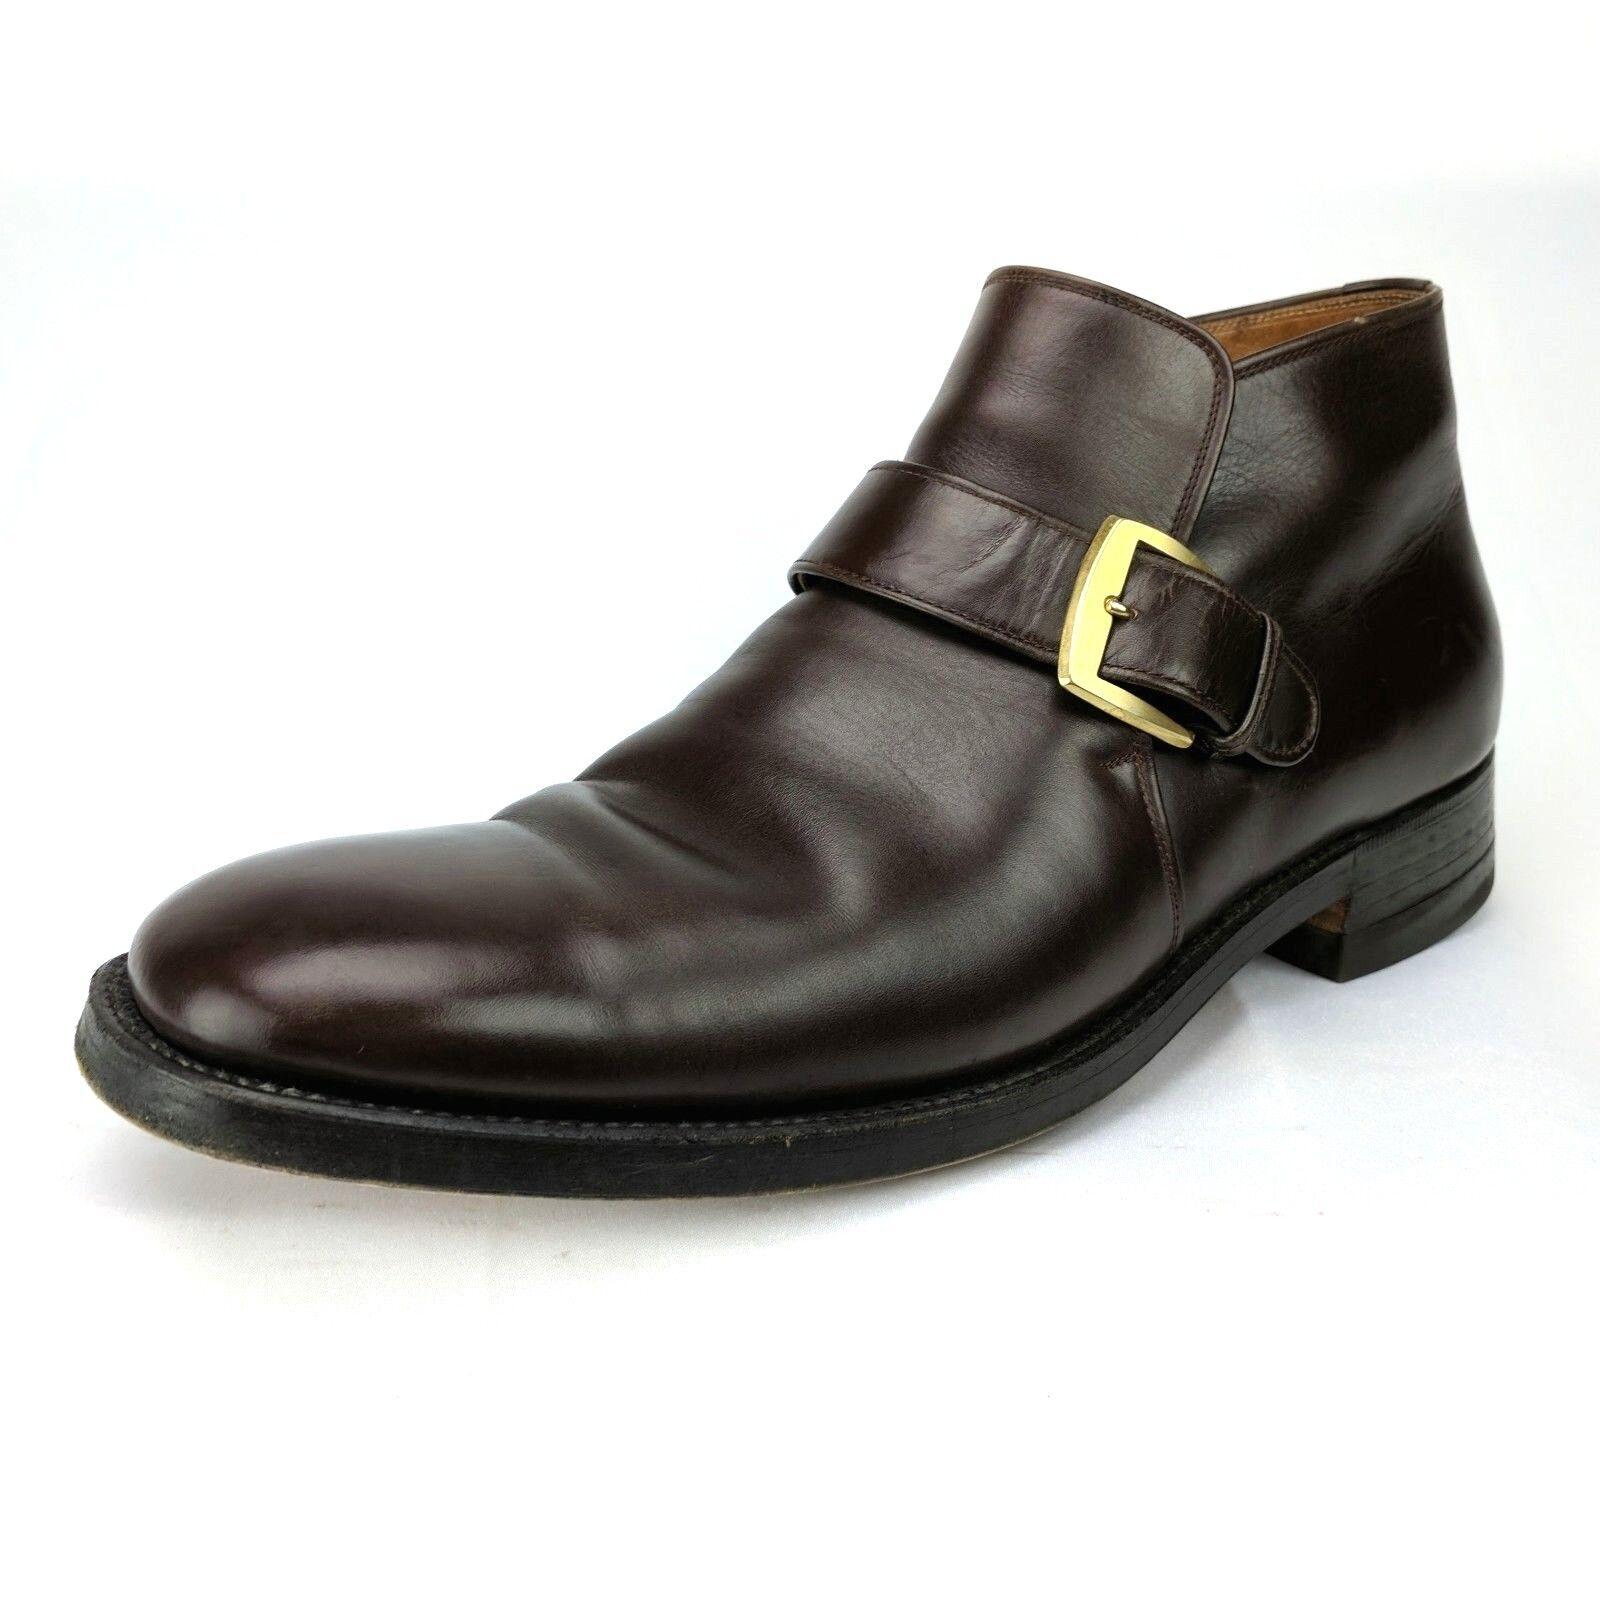 Vintage Kow Hoo zapatos Co. Bespoke Monje Correa de tobillo bota de vestir para hombre D